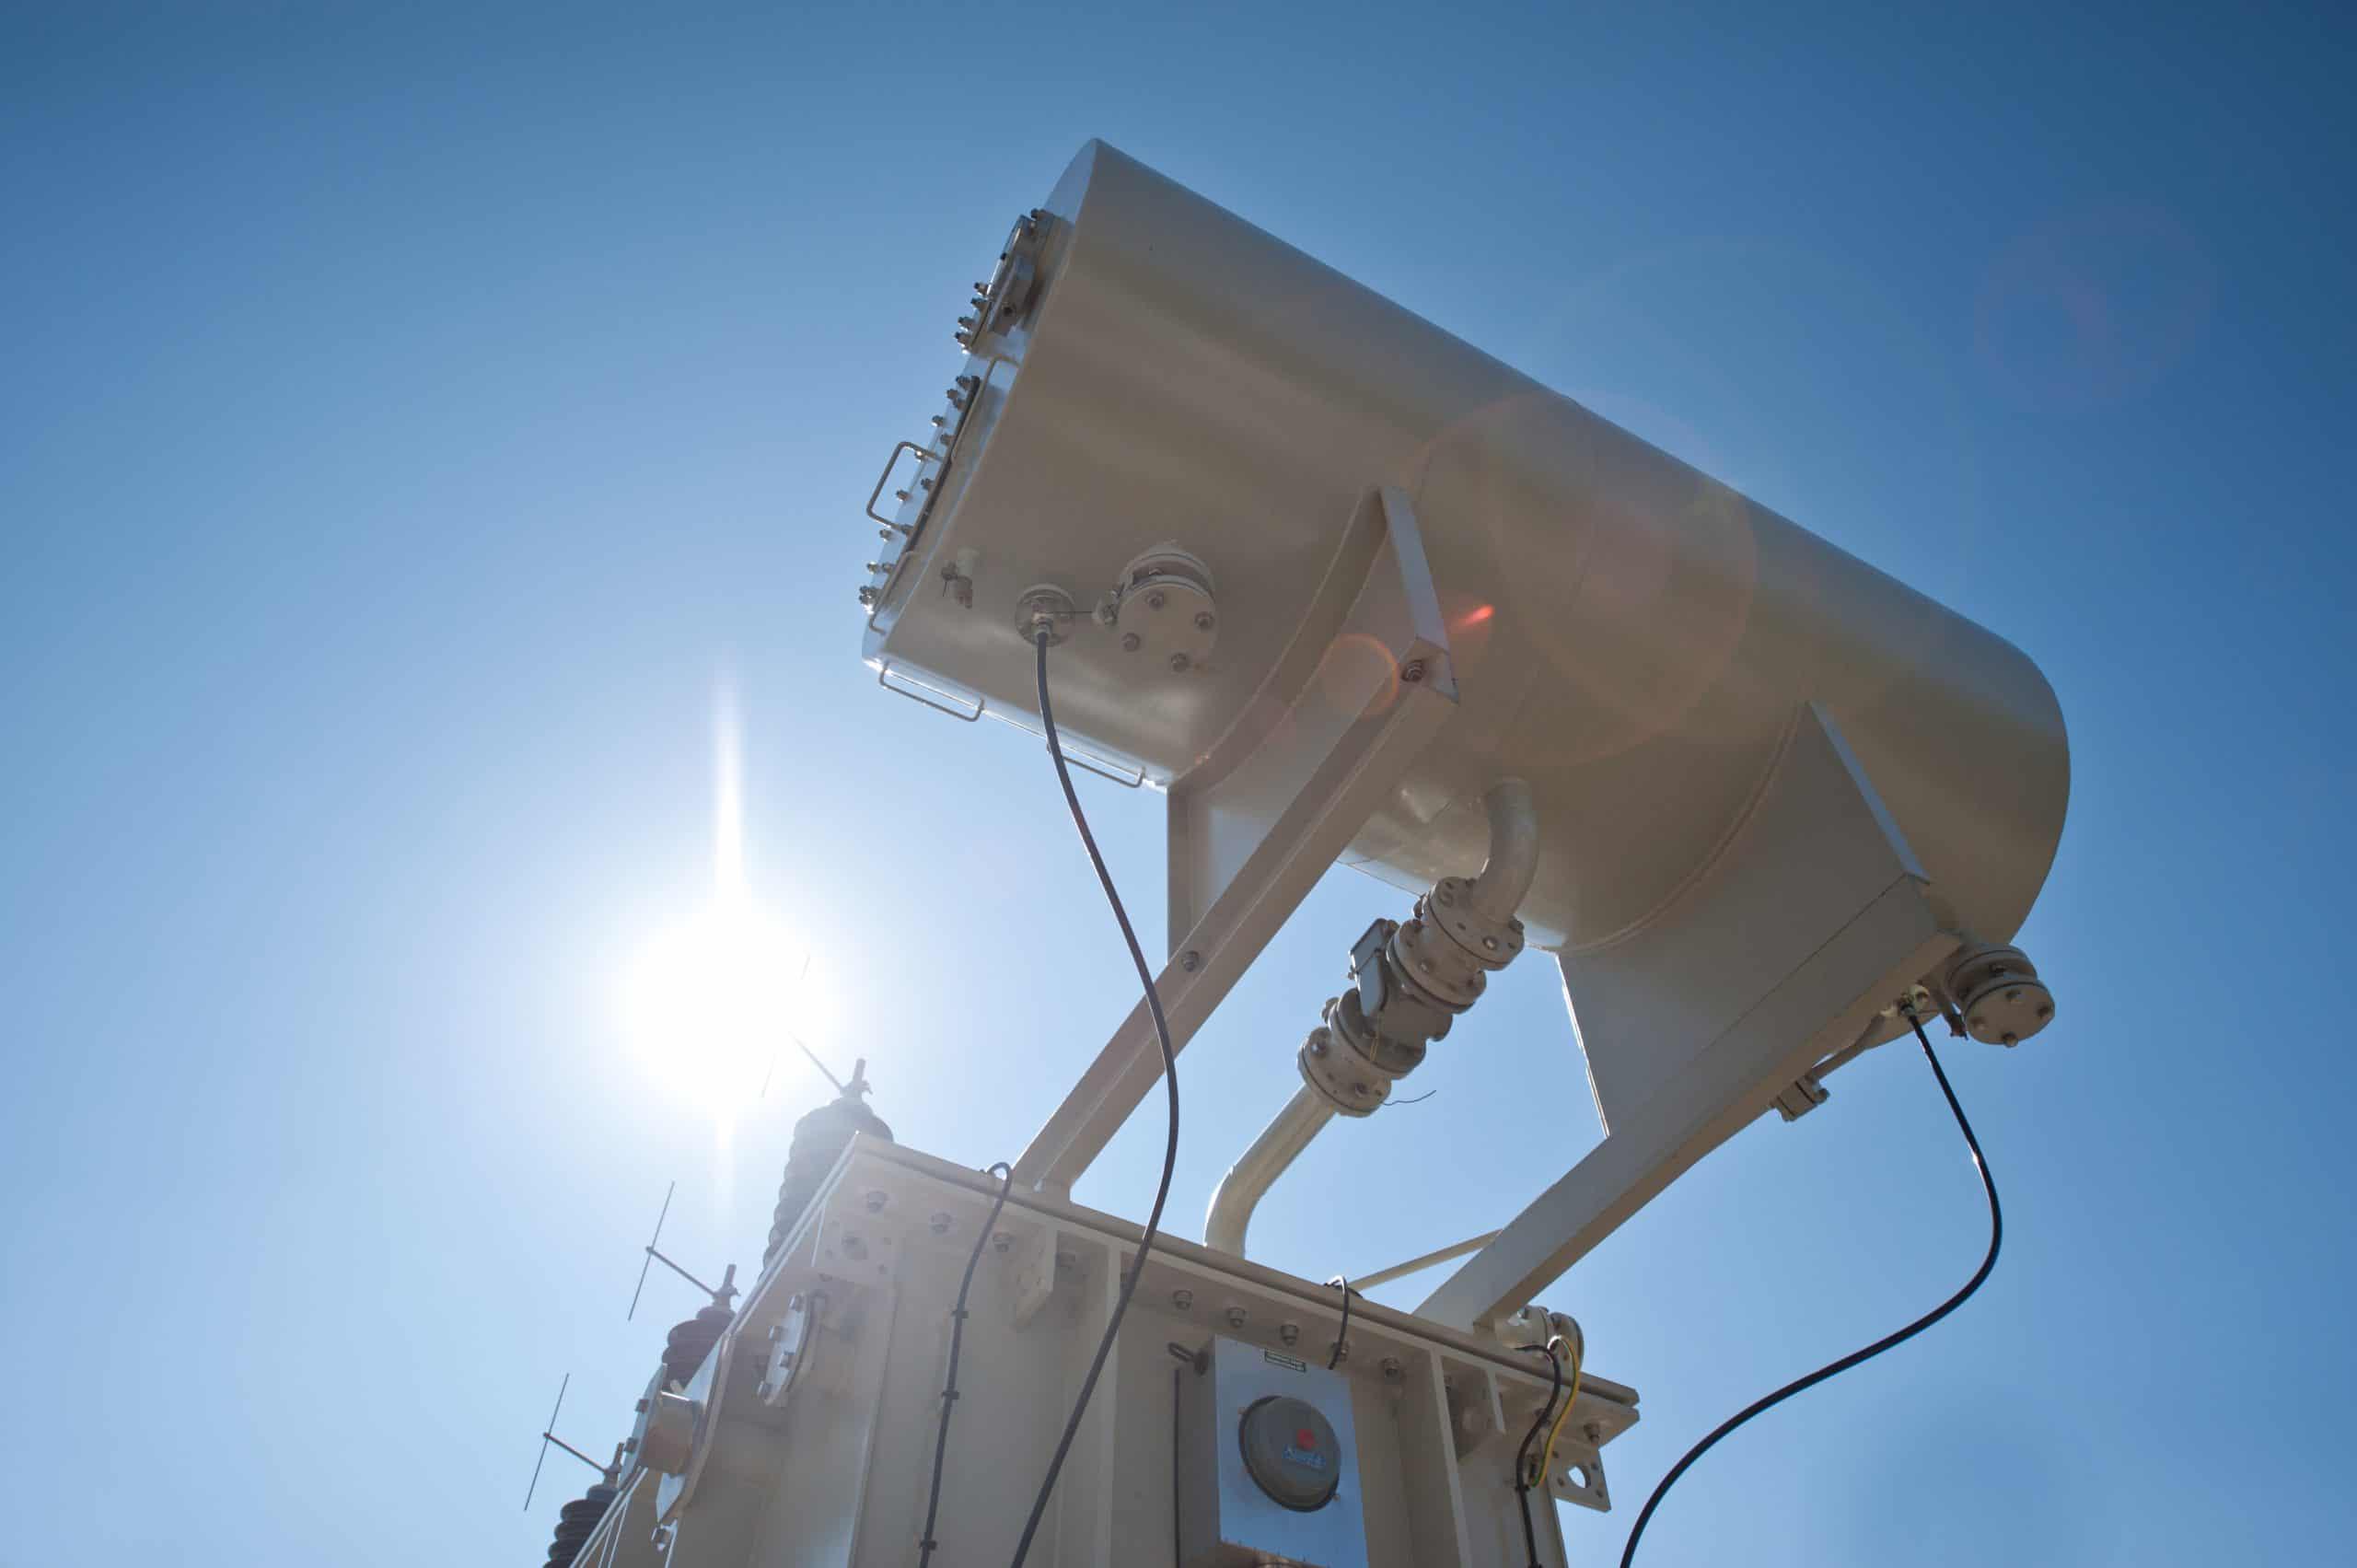 Power transformer expansion tank